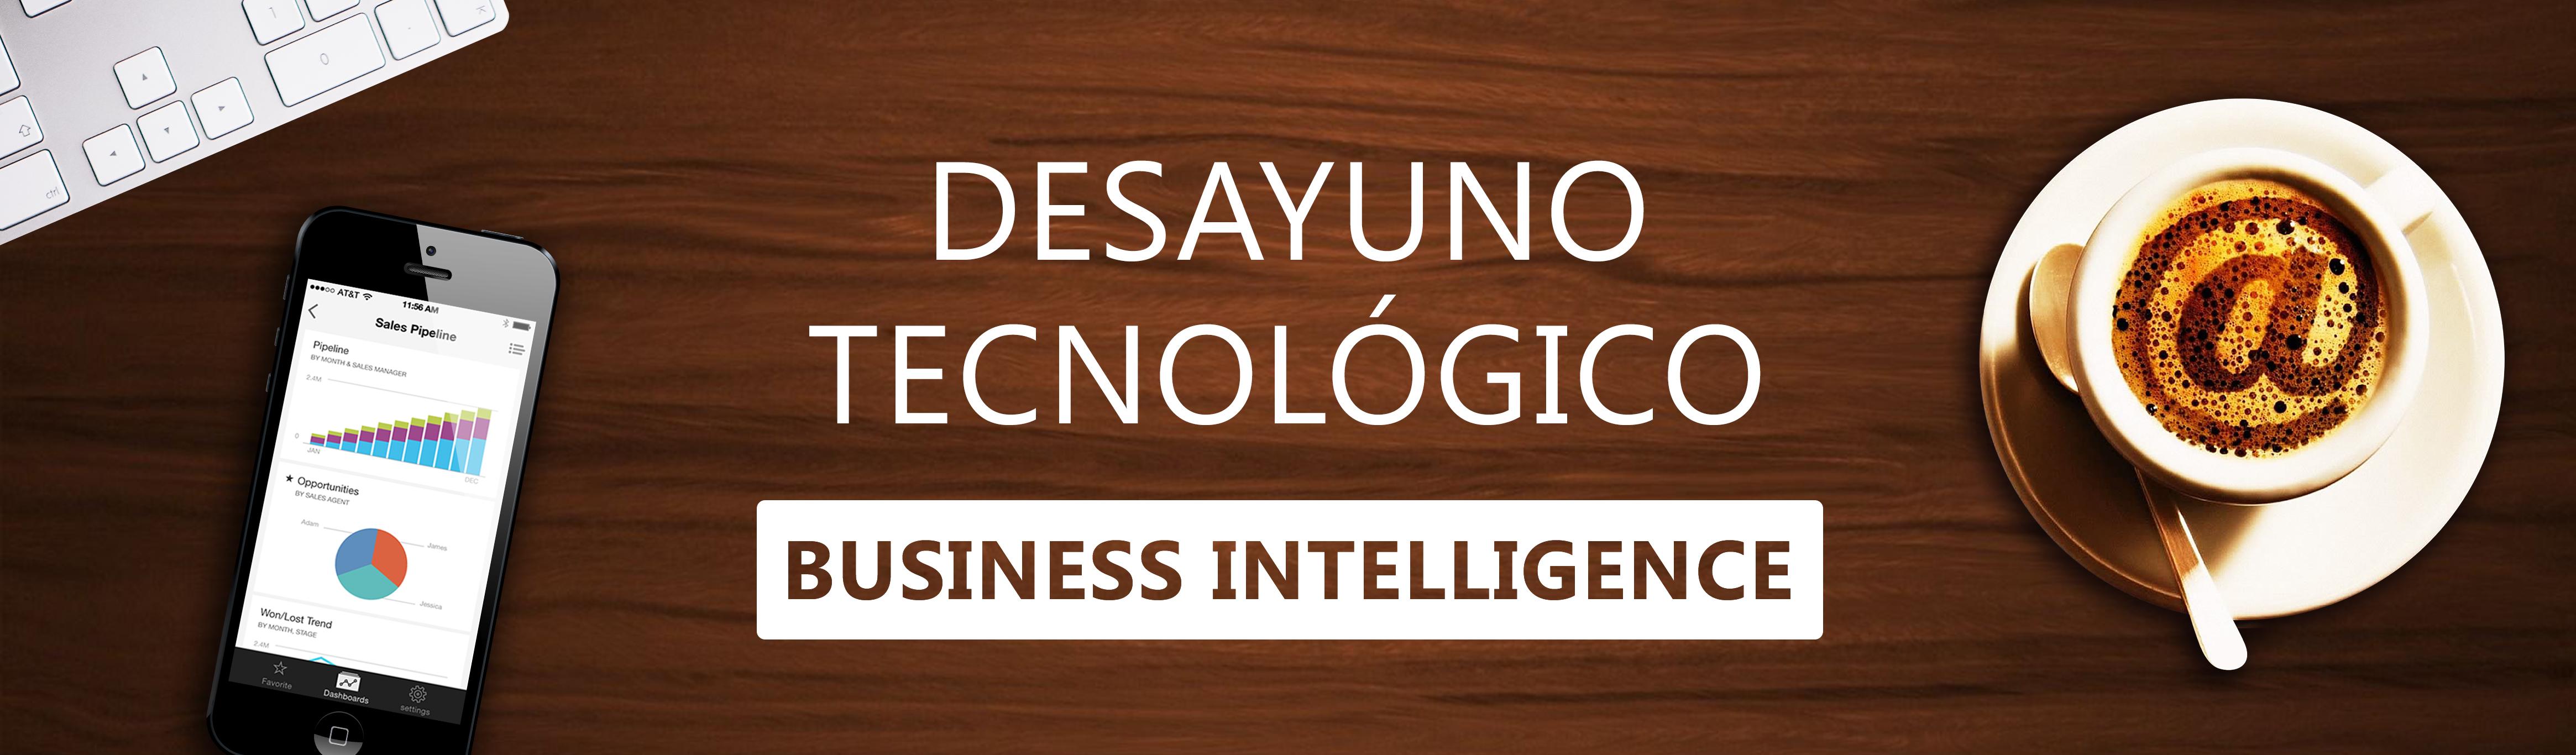 Desayuno tecnológico – Business Intelligence